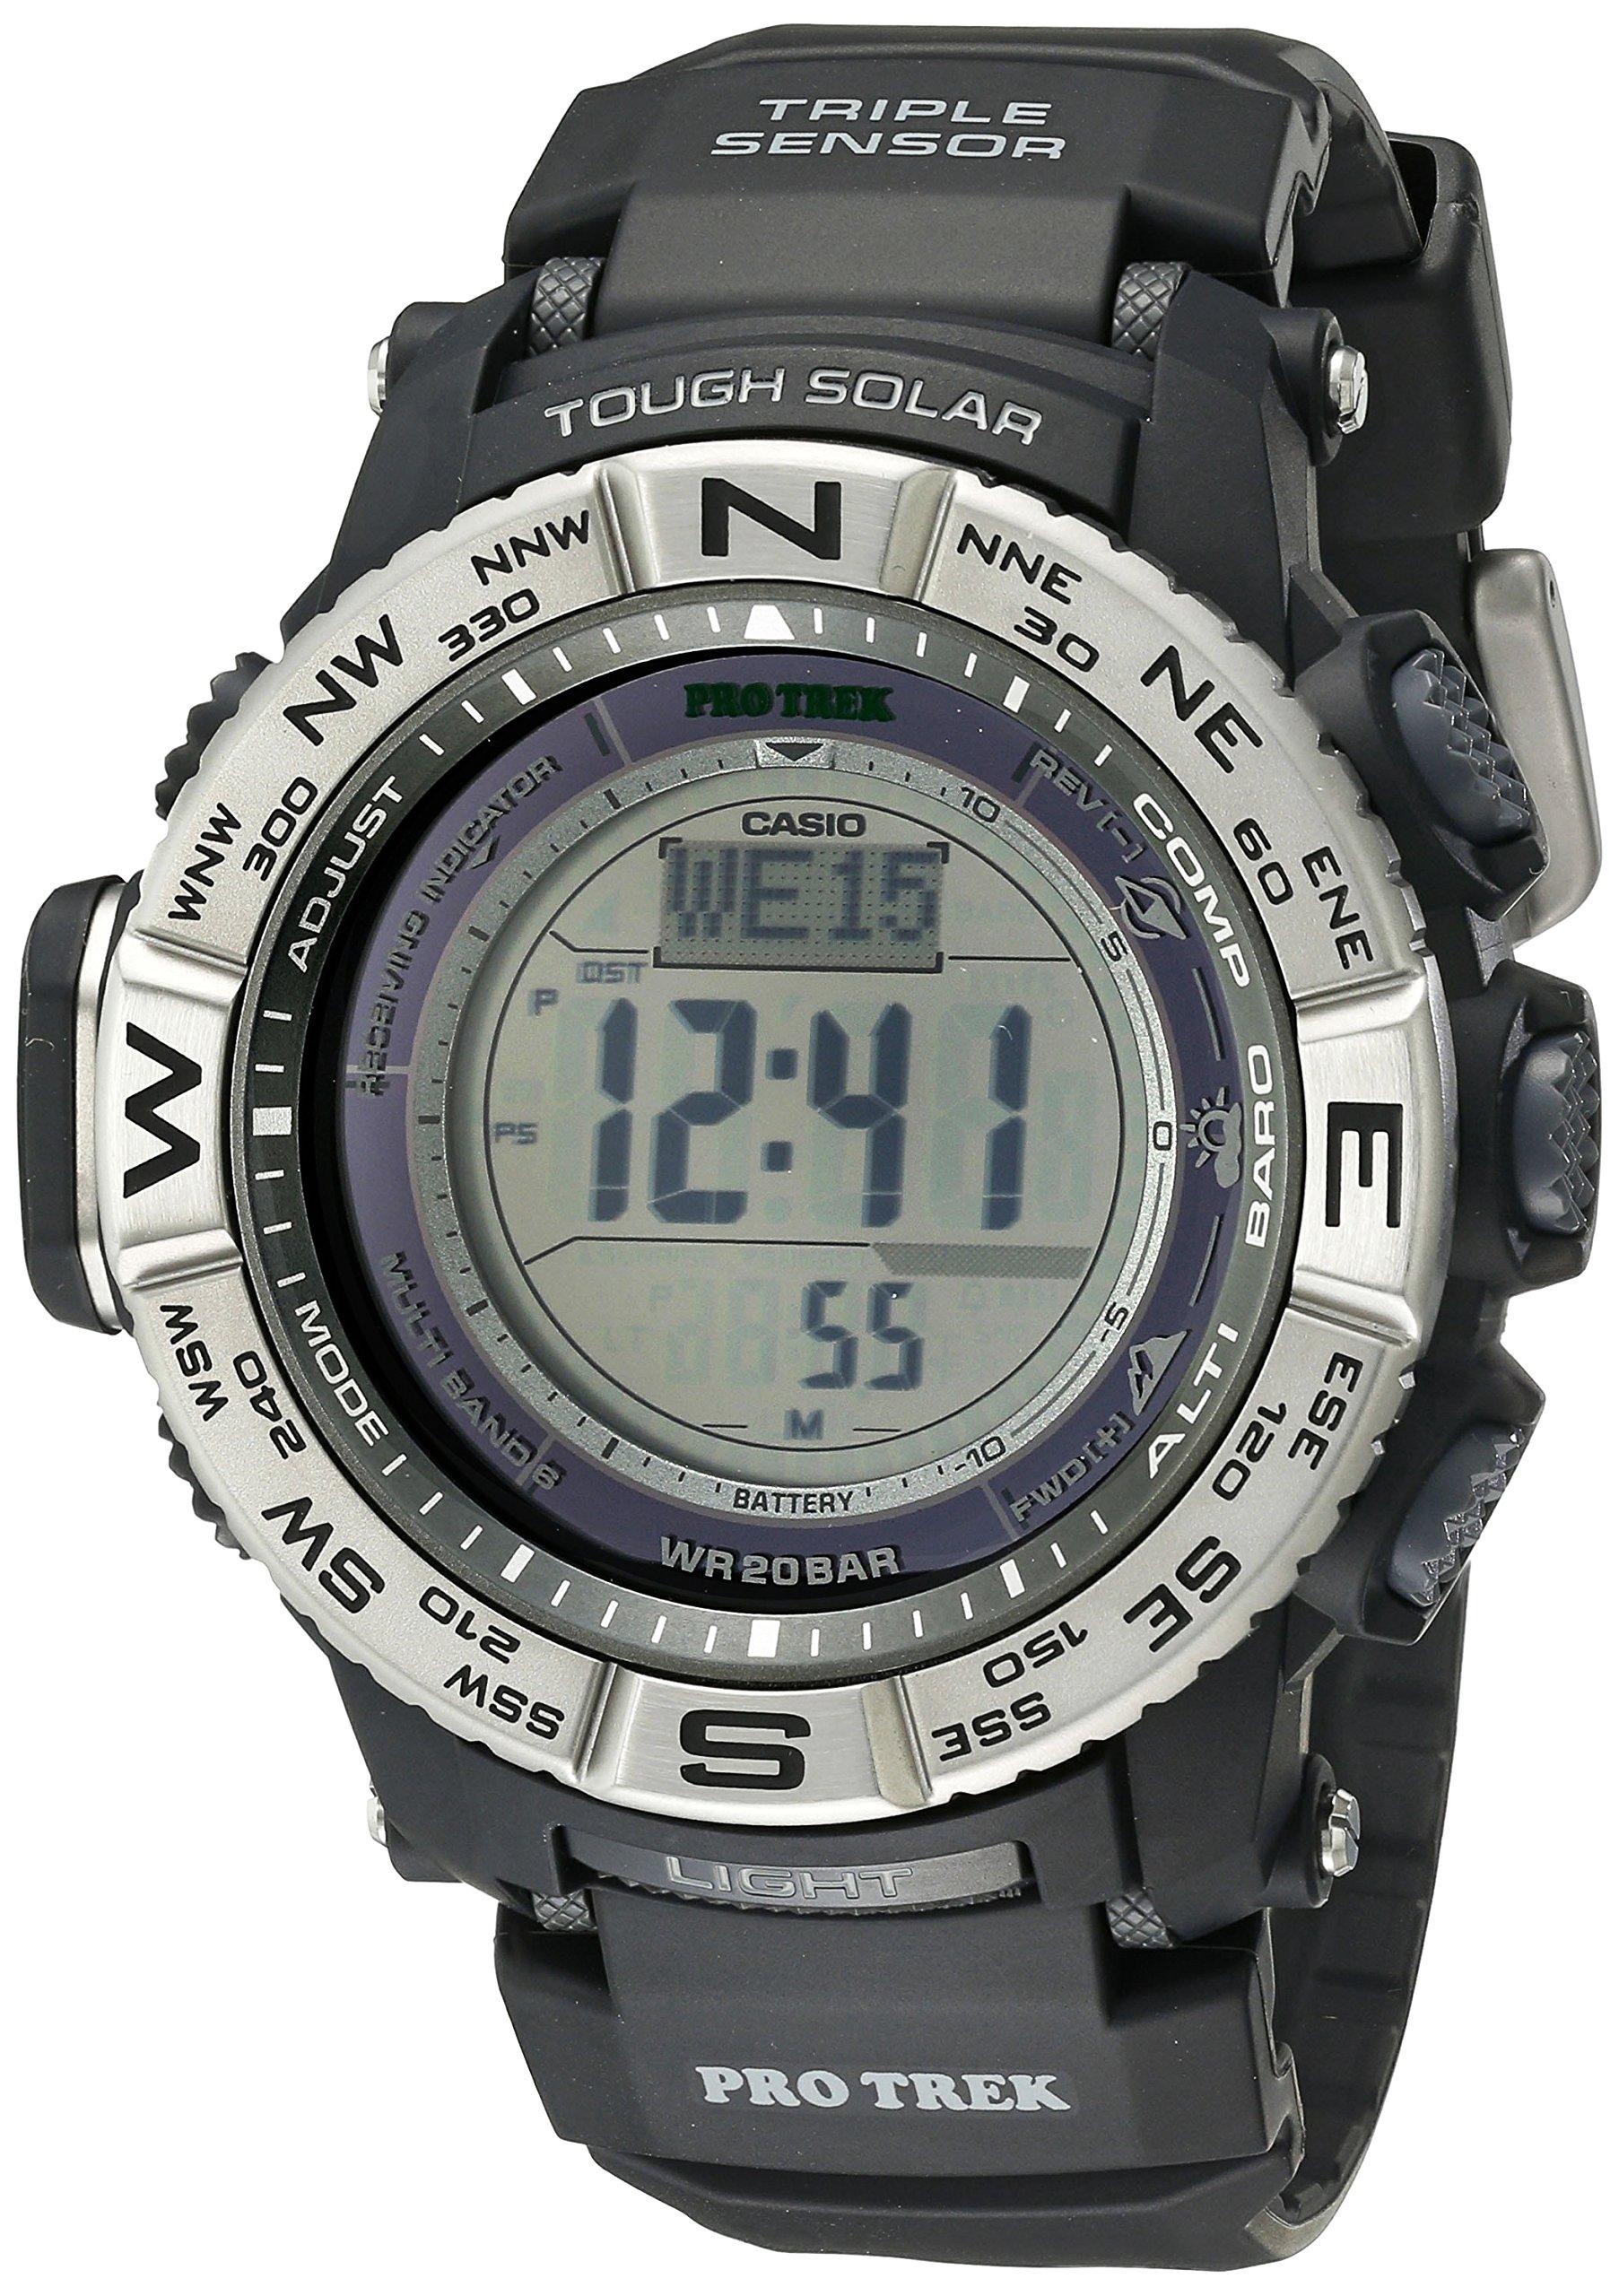 Casio Men's Pro Trek PRW-3500-1CR Solar Powered Atomic Resin Digital Watch by Casio (Image #1)